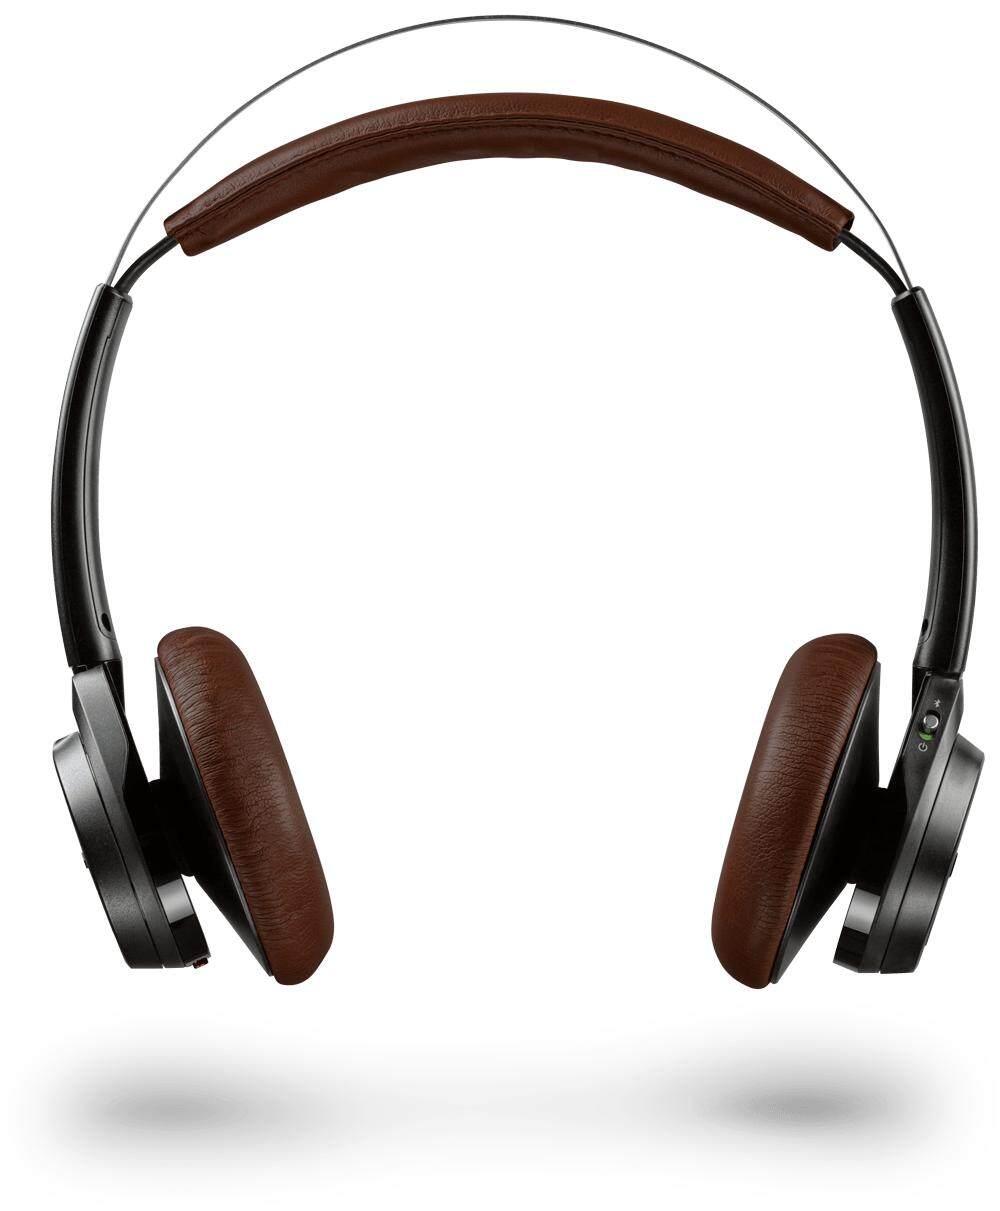 Authentic Plantronics BackBeat Sense Stereo Bluetooth Headset with Microphone for Smarpthones Huawei Motorola Xiaomi Oppo Vivo Samsung